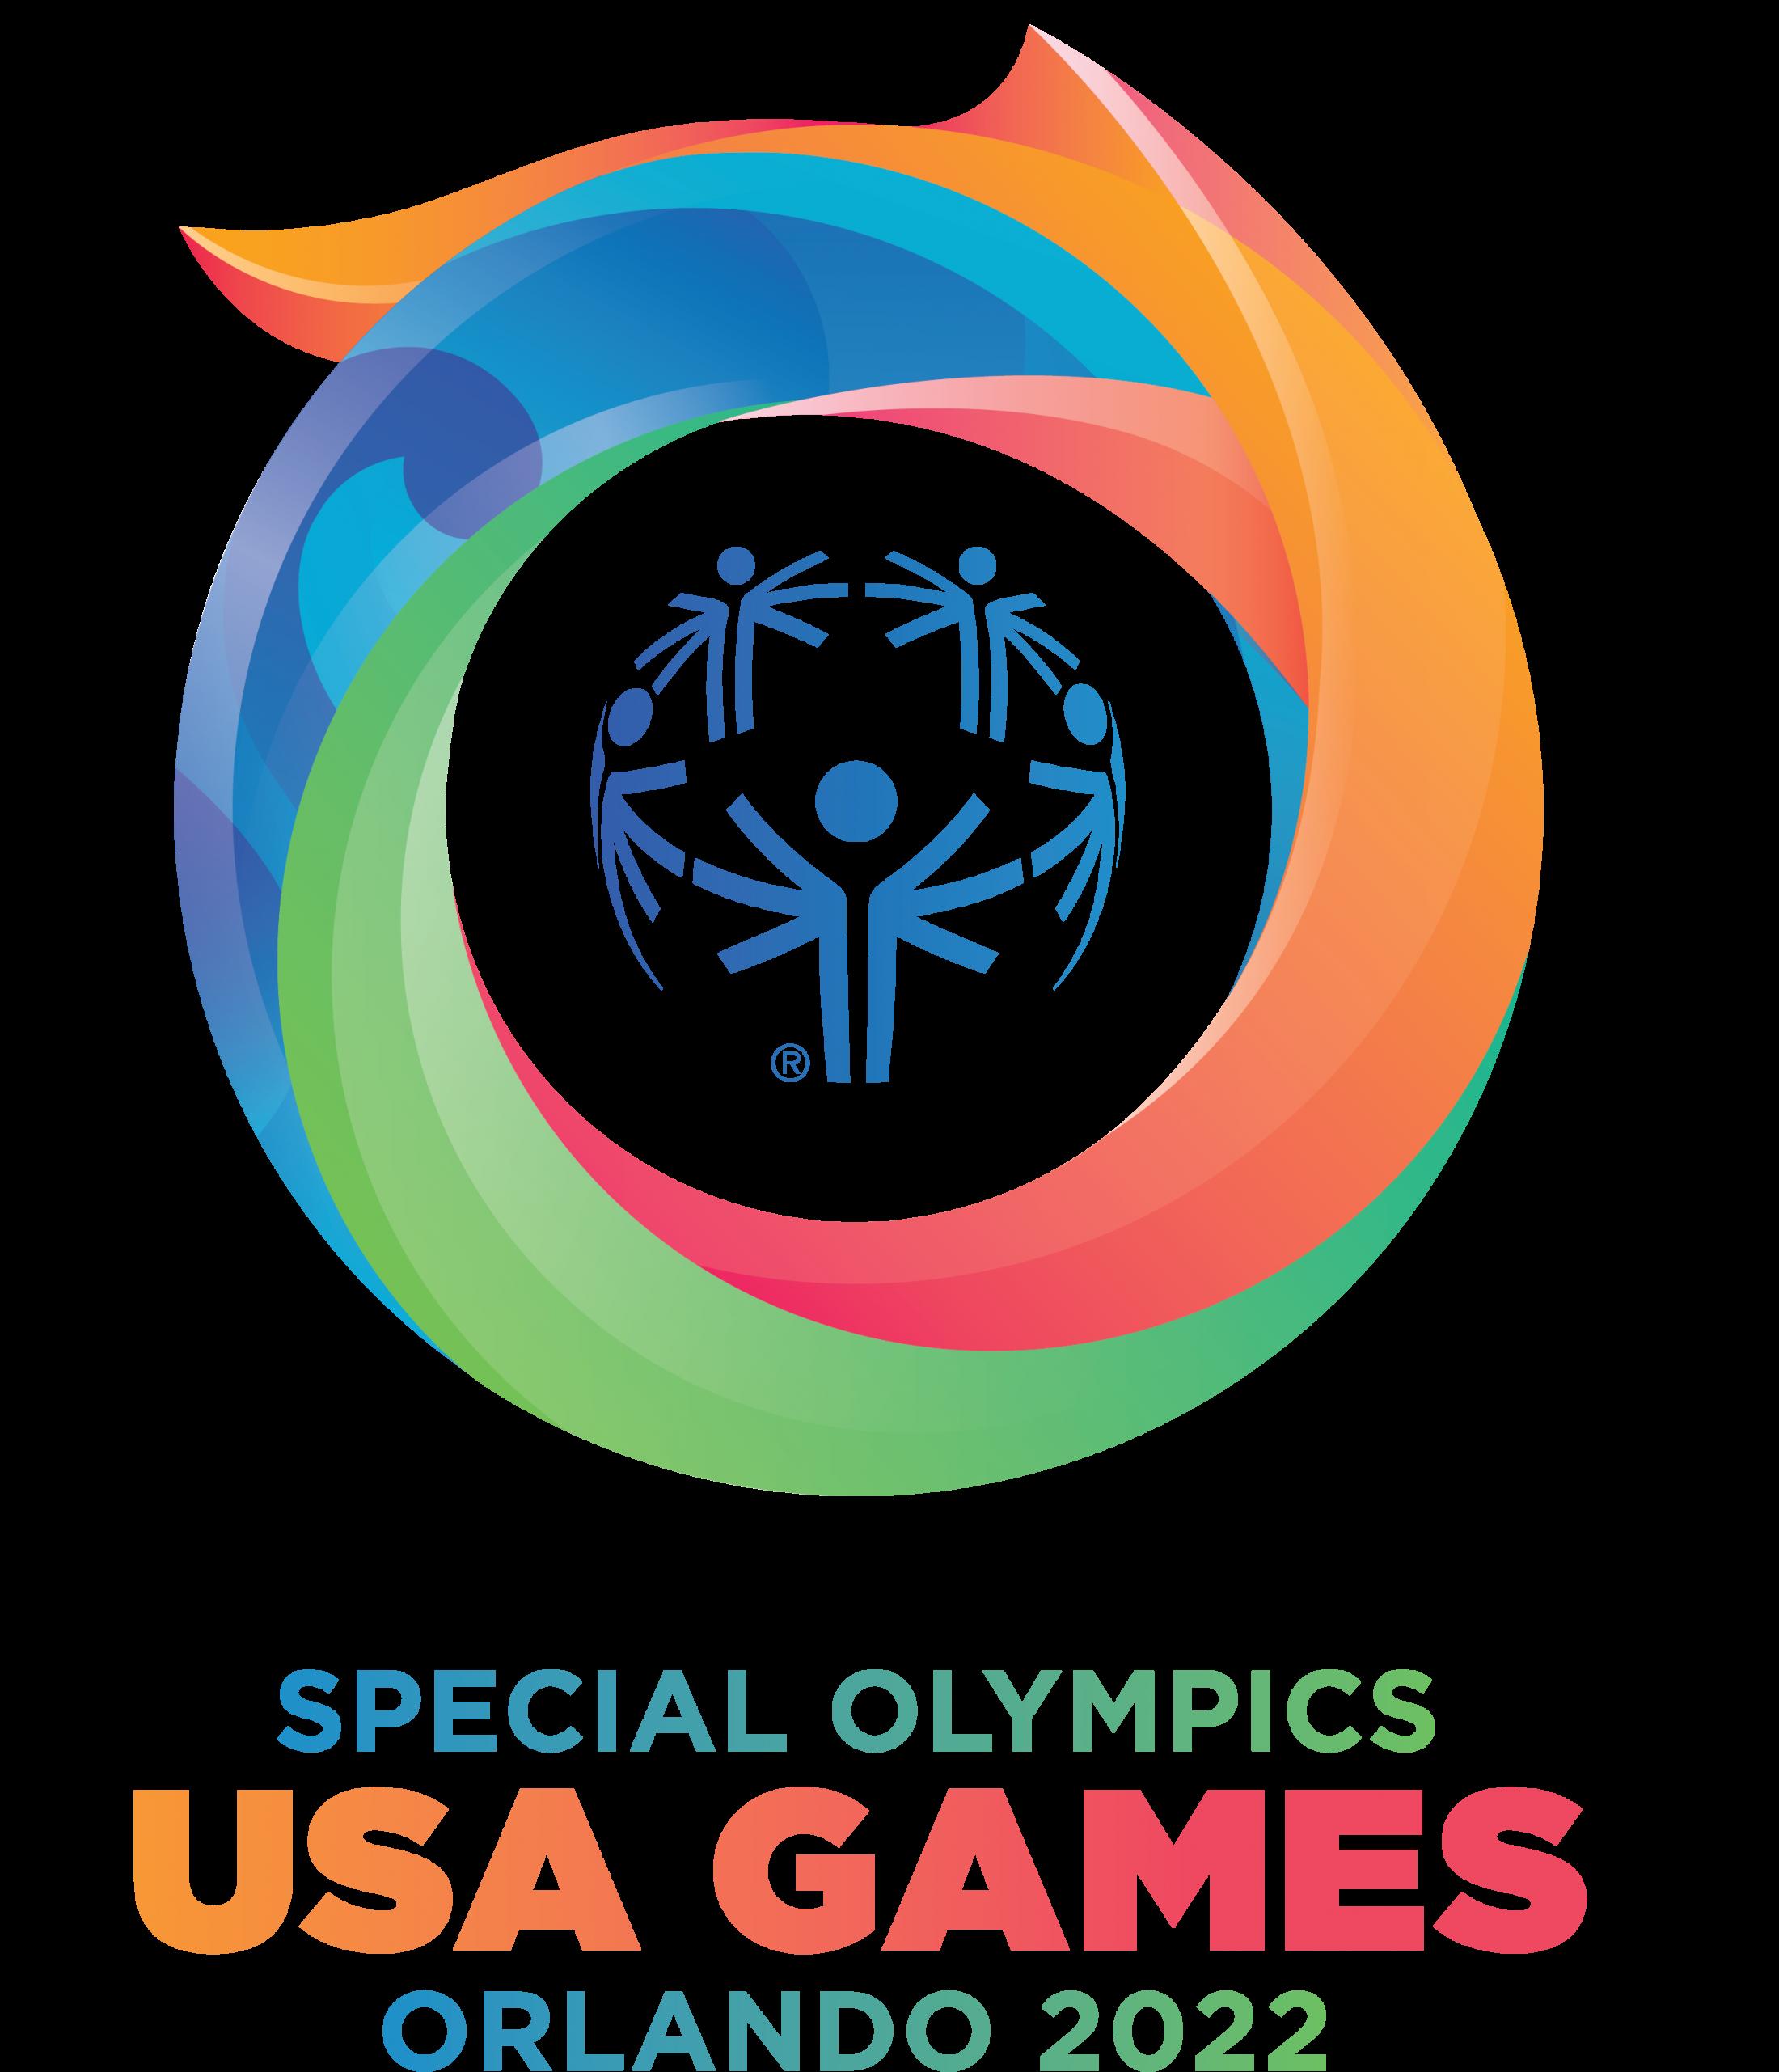 Special Olympics Logo Special Olympics Logo Special Olympics Olympics